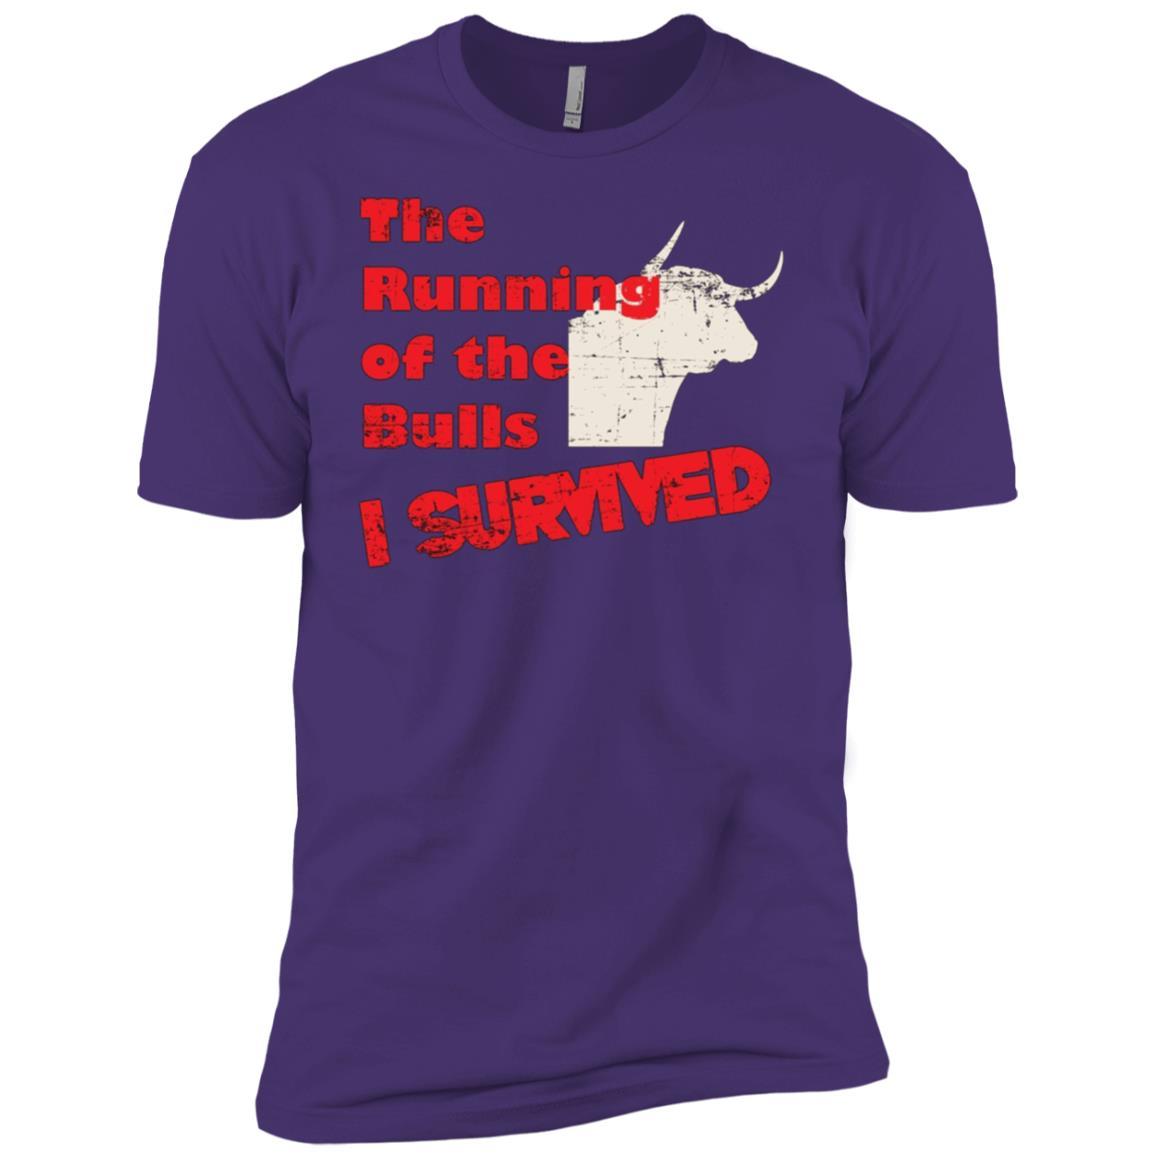 The Running of the Bulls Men Short Sleeve T-Shirt